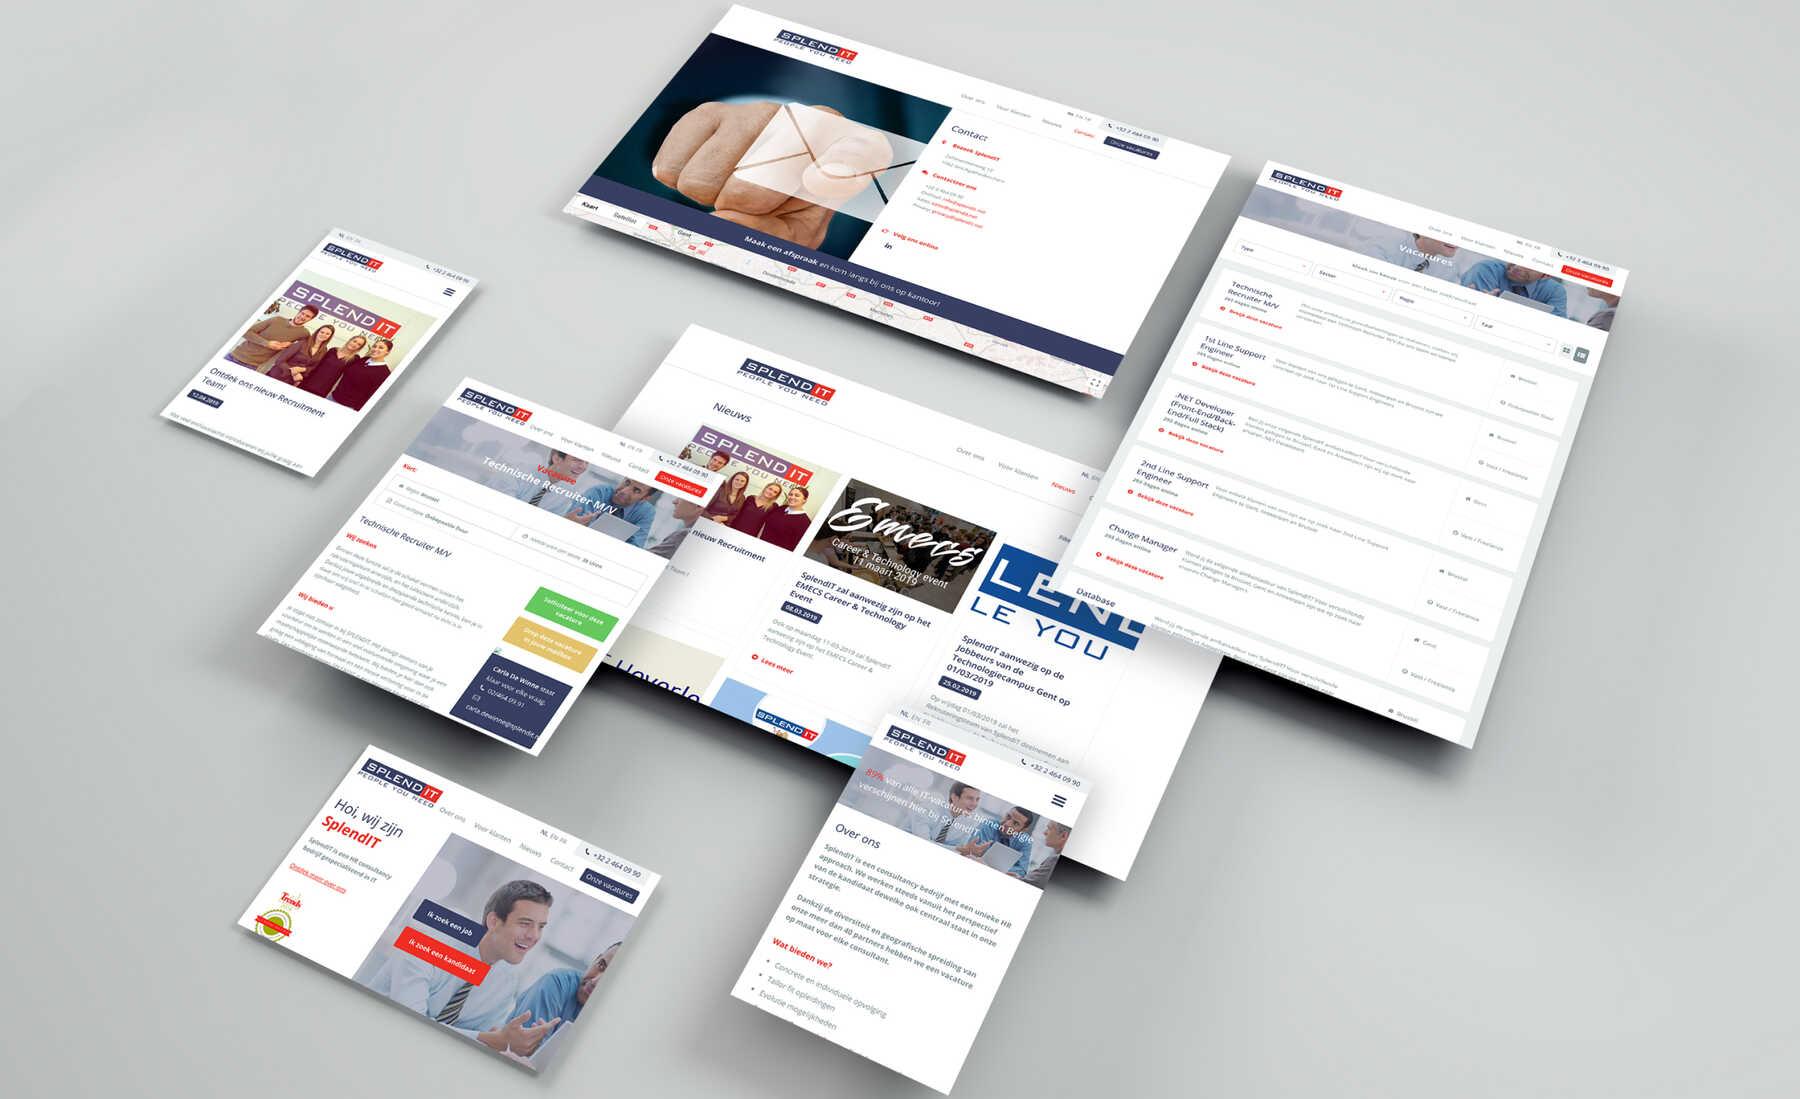 splendit vacatureplatform site design